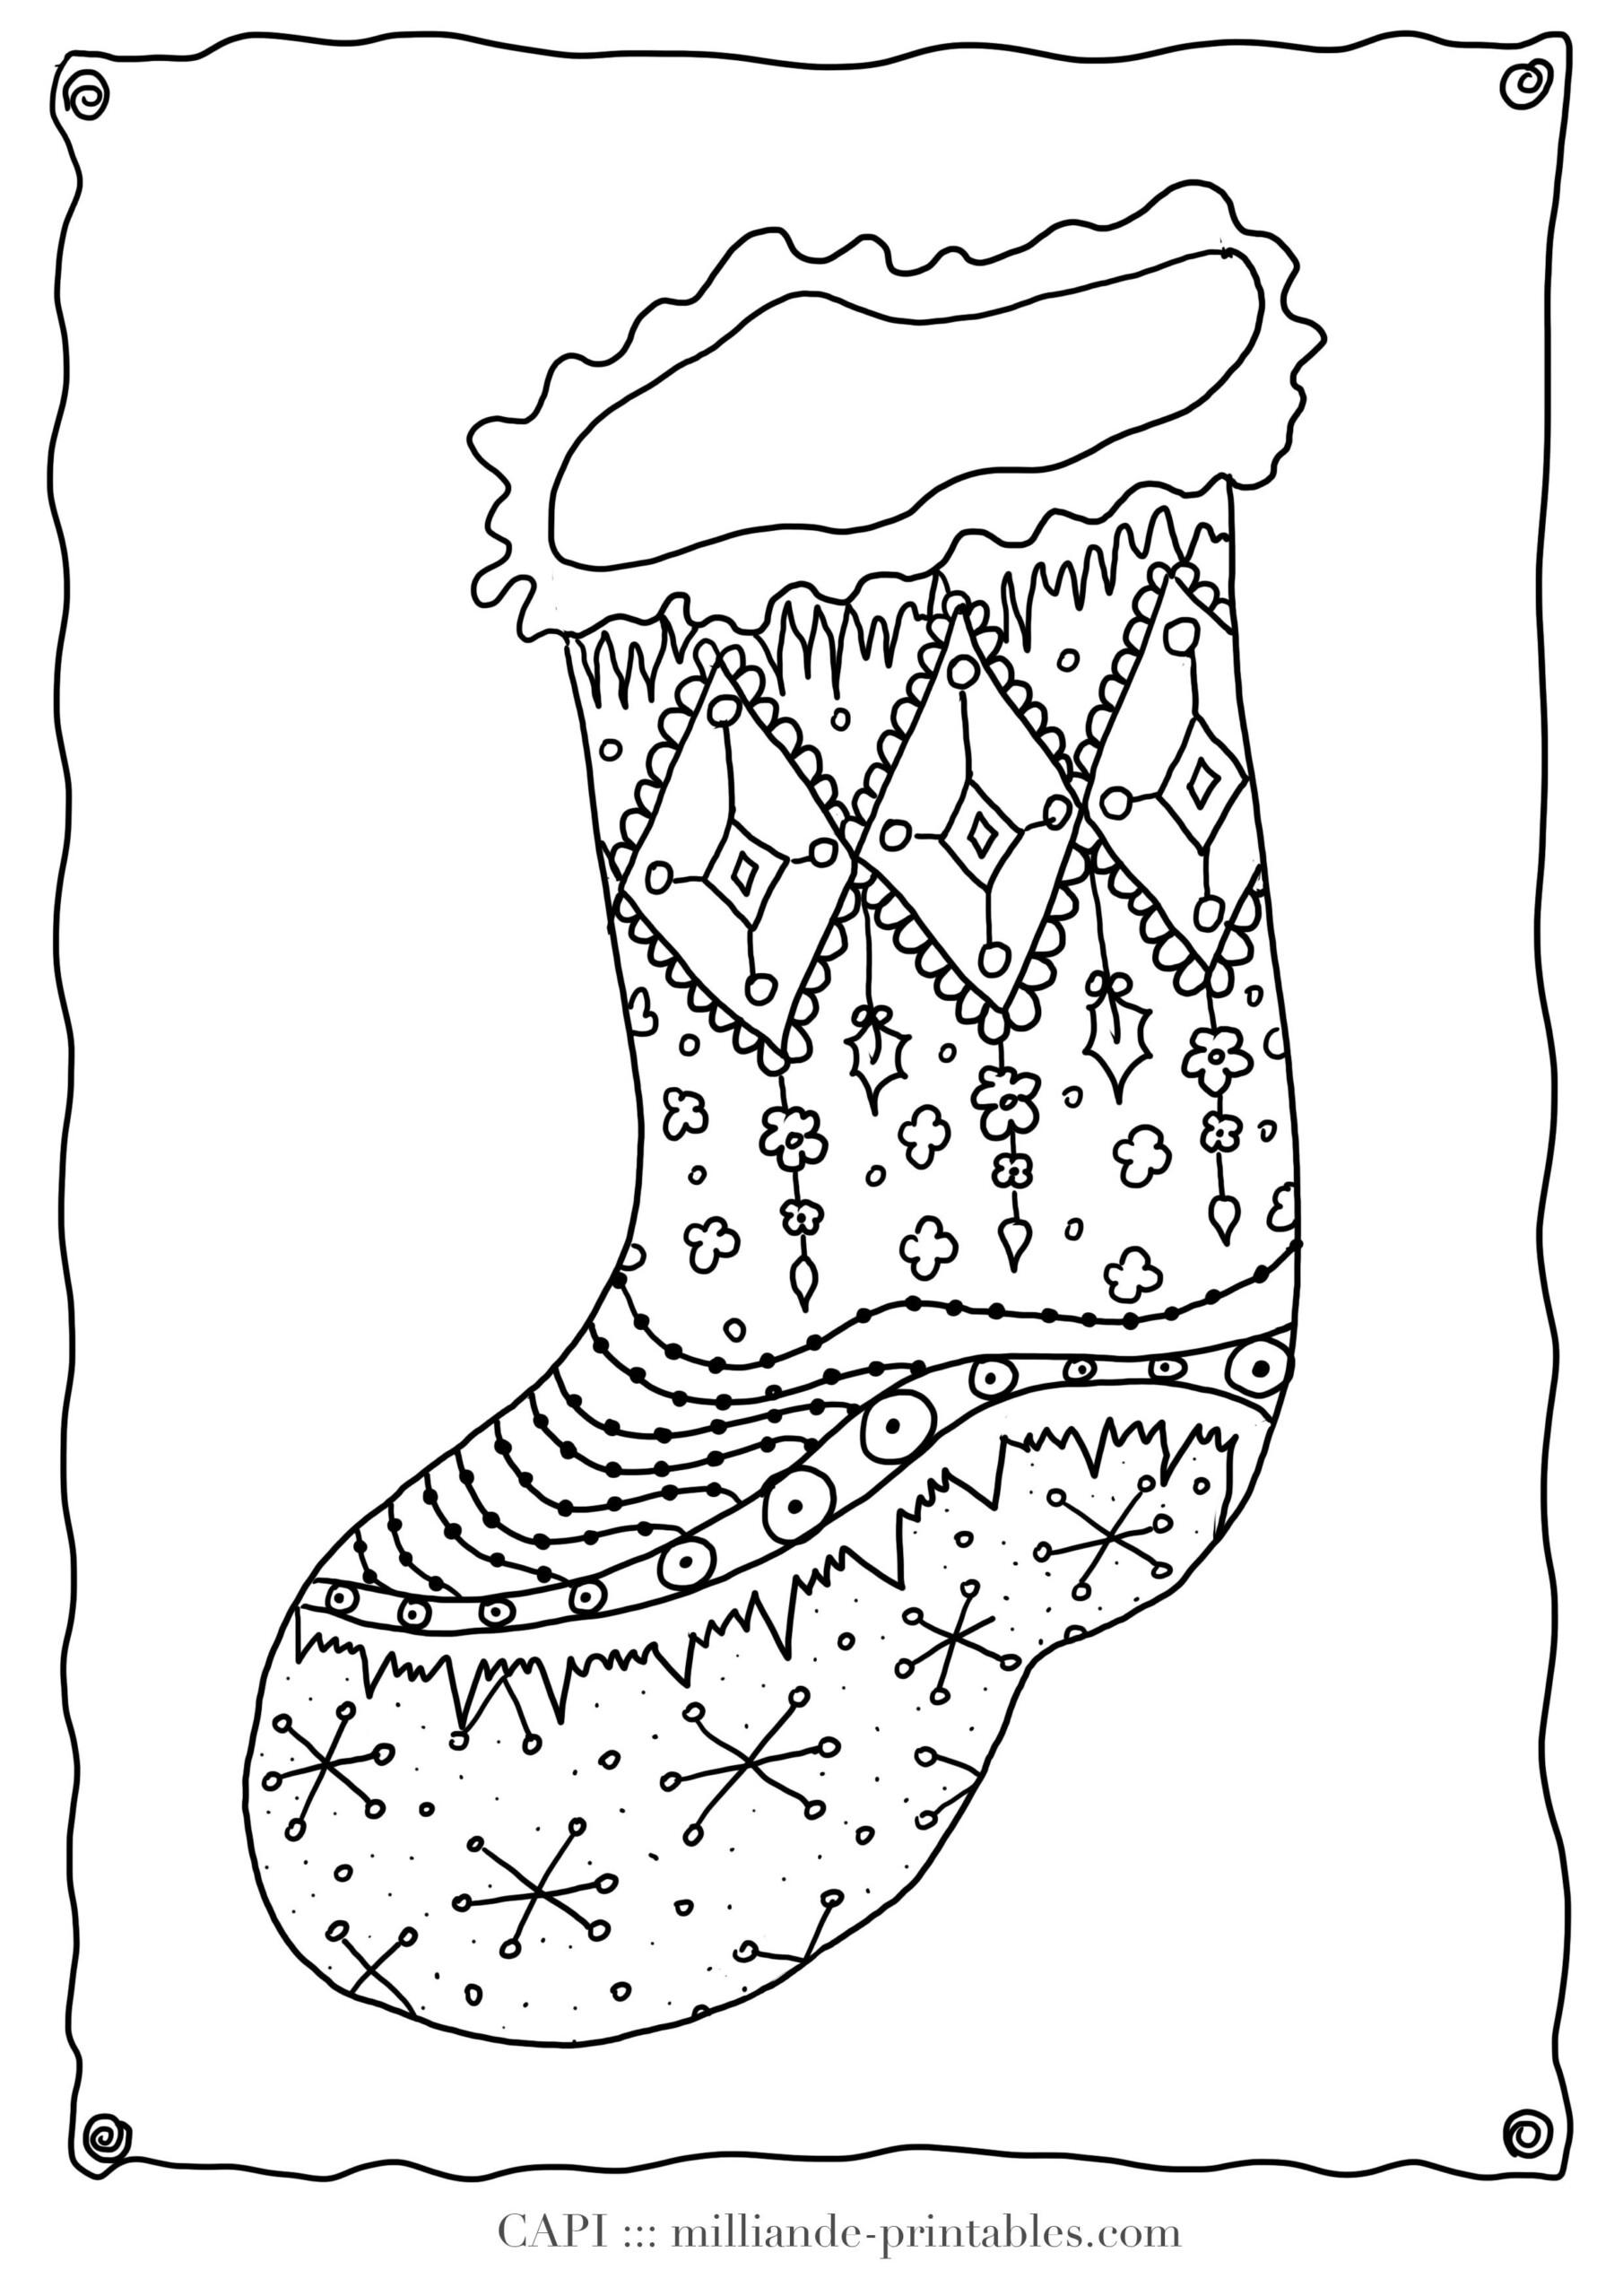 Christmas Coloring Page Stocking, Milliande's Free Christmas